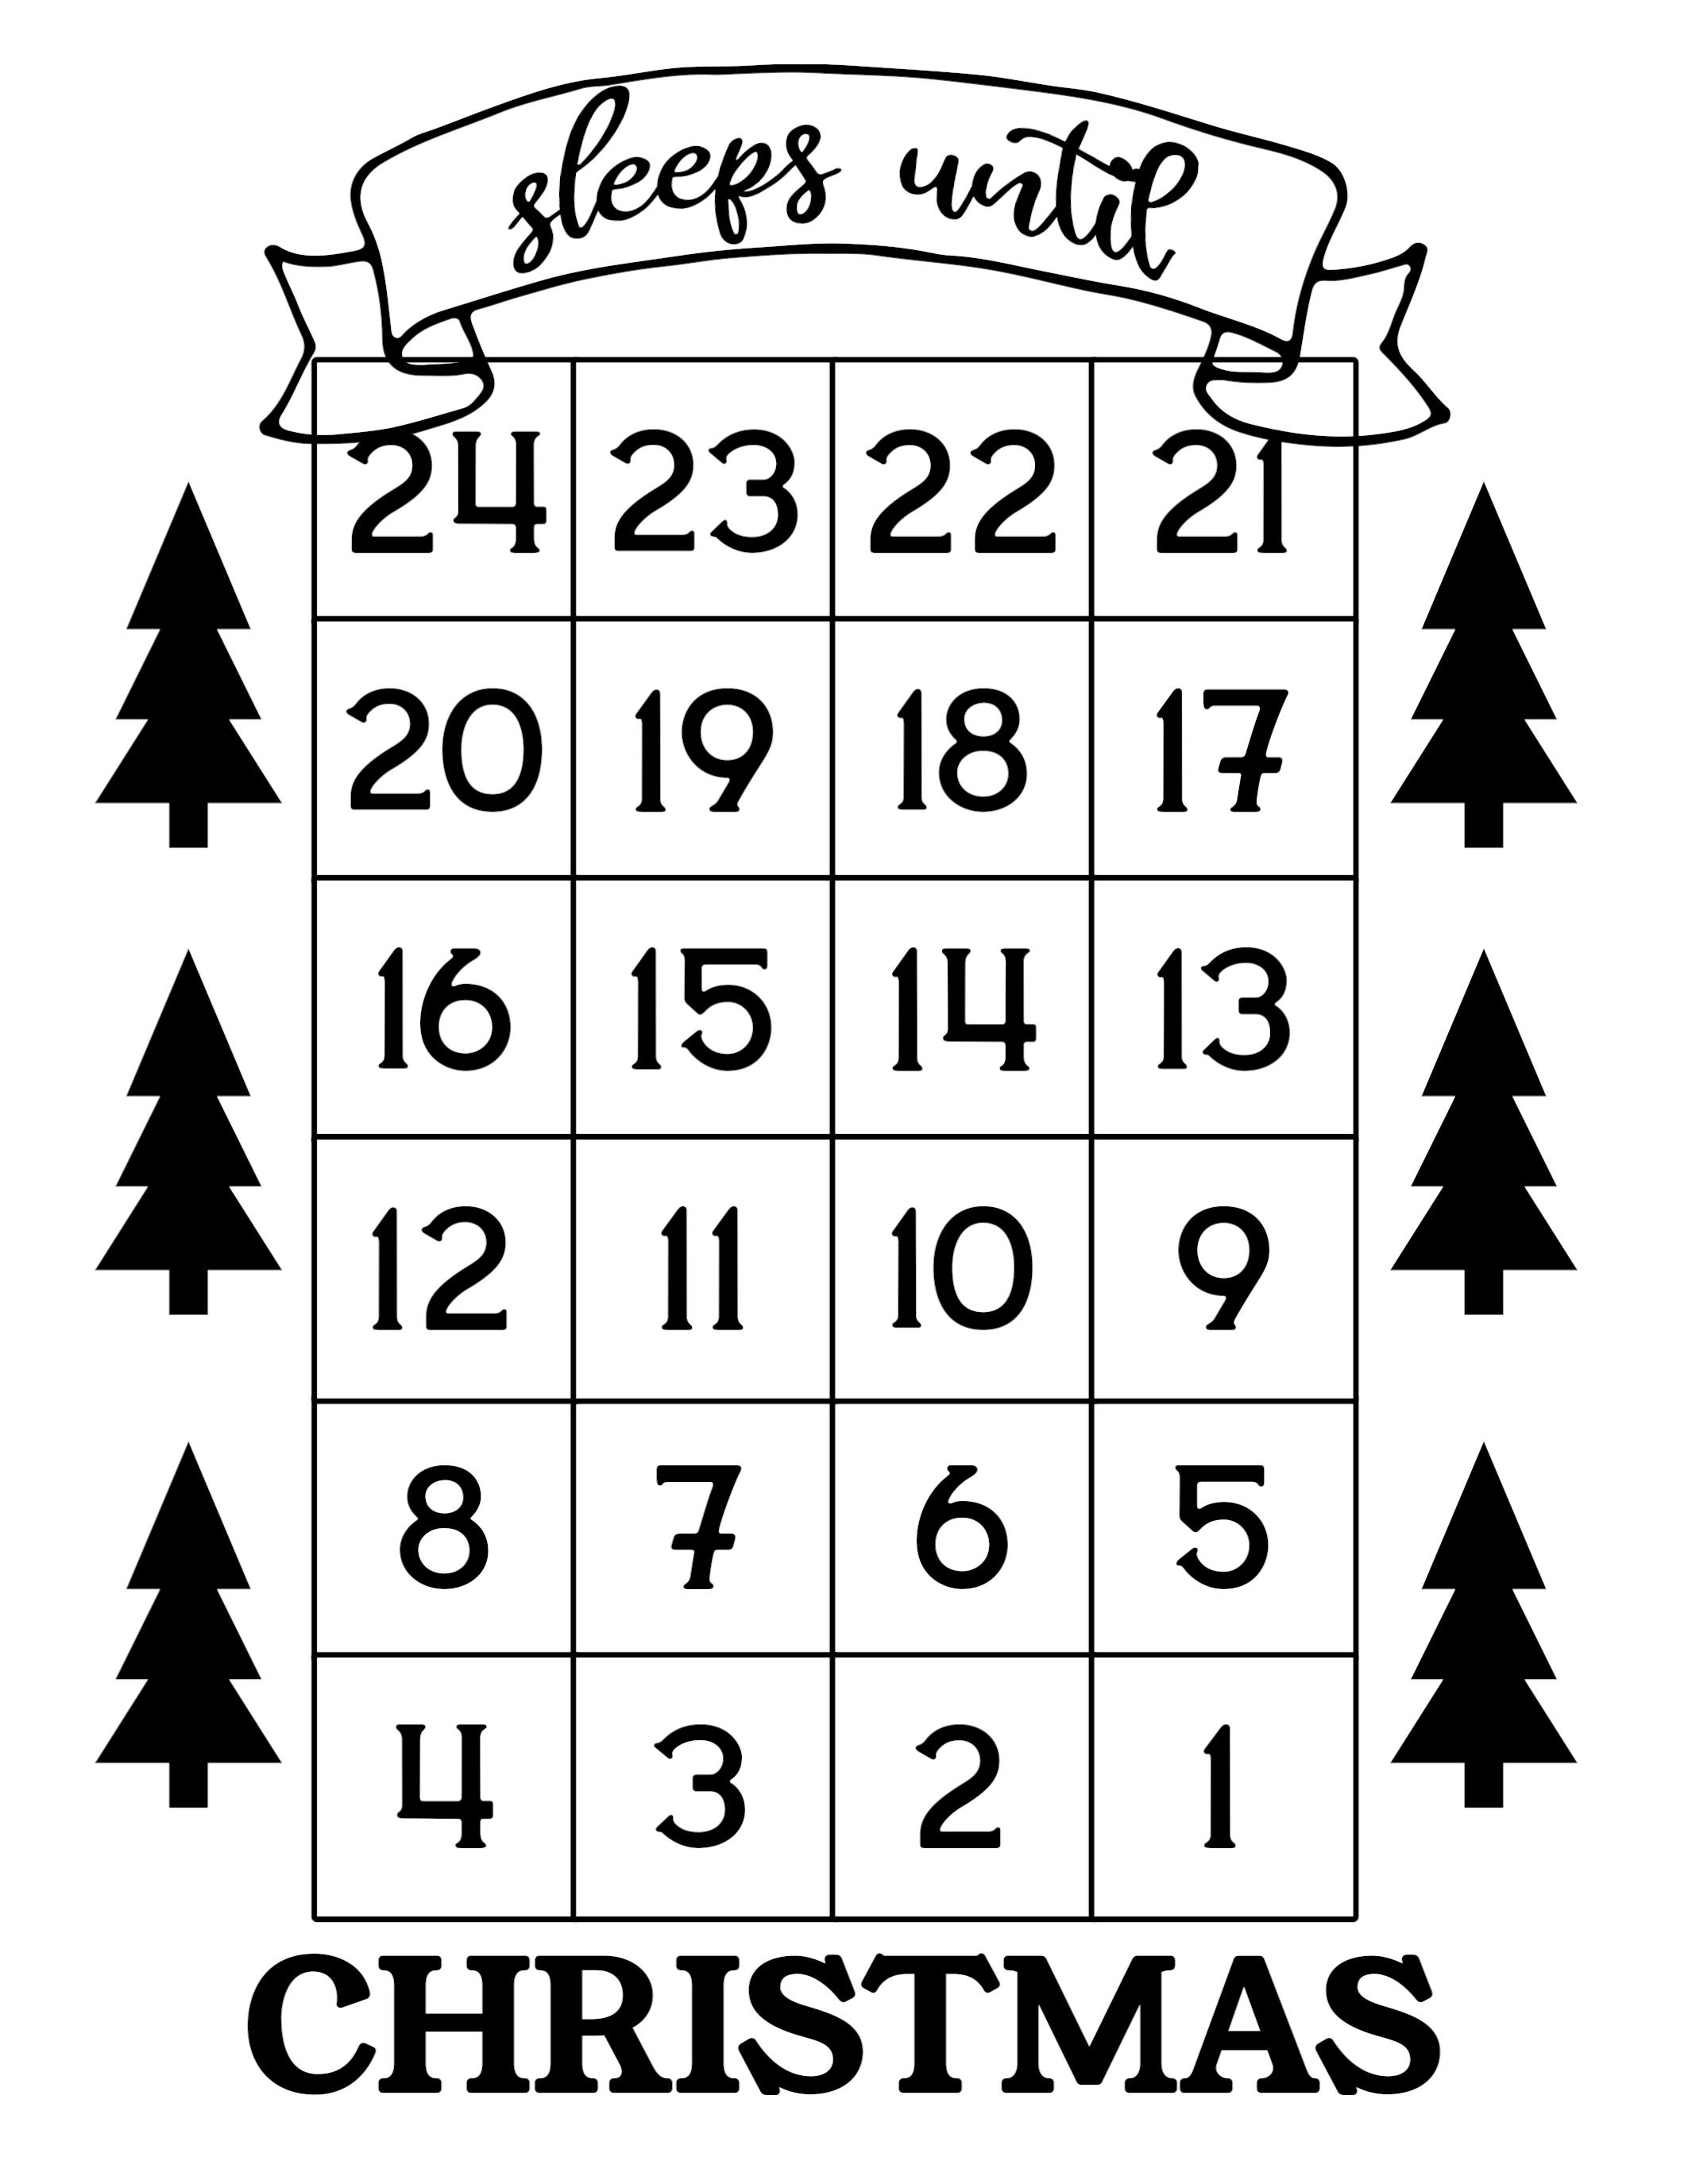 How Many Days Until Christmas Free Printable - Paper Trail Xmas Countdown 2020 Clendar Printable